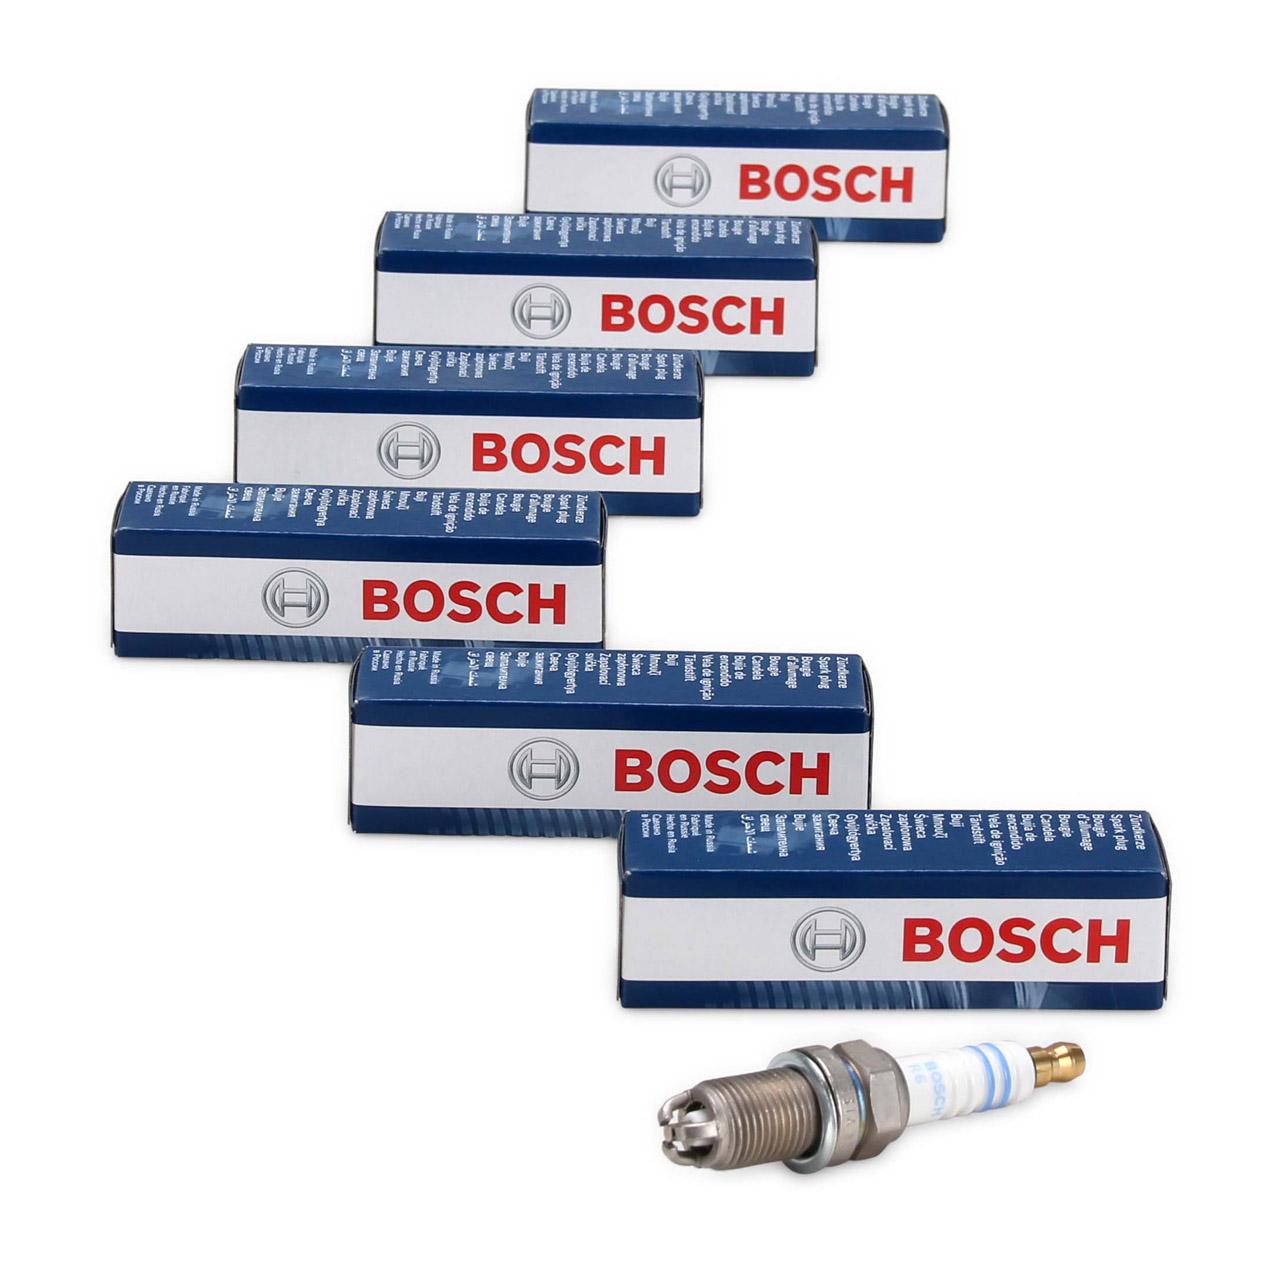 6x BOSCH 0242245539 FR5DTC Zündkerze NICKEL für PORSCHE 911 (964 993) Carrera